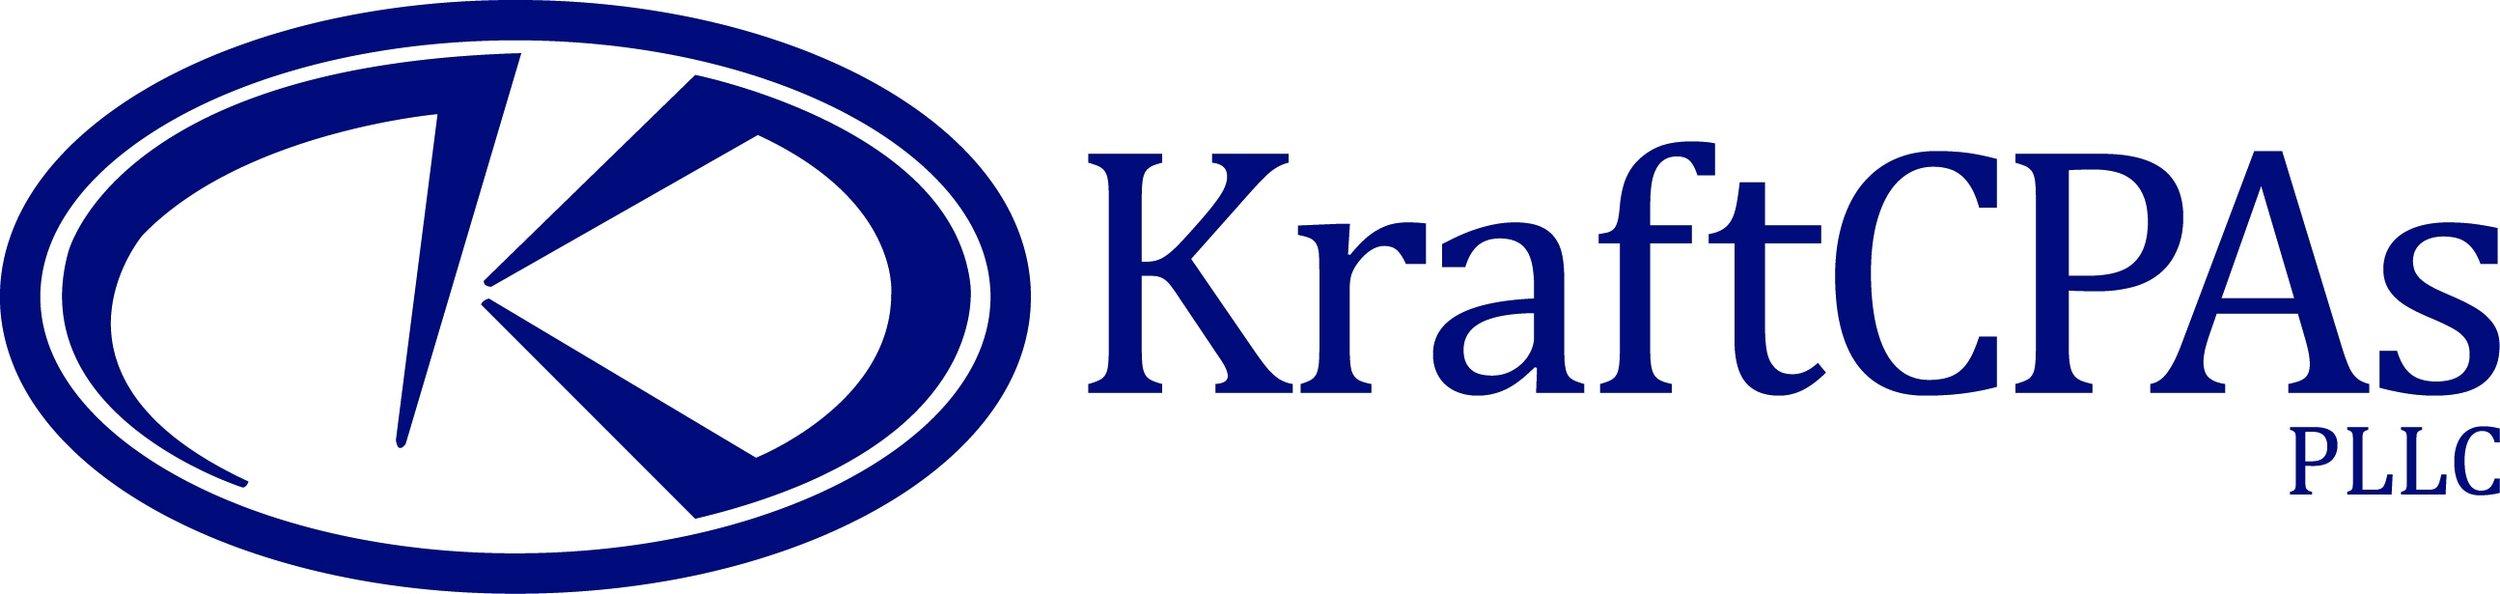 KraftCPAs-2016.jpg